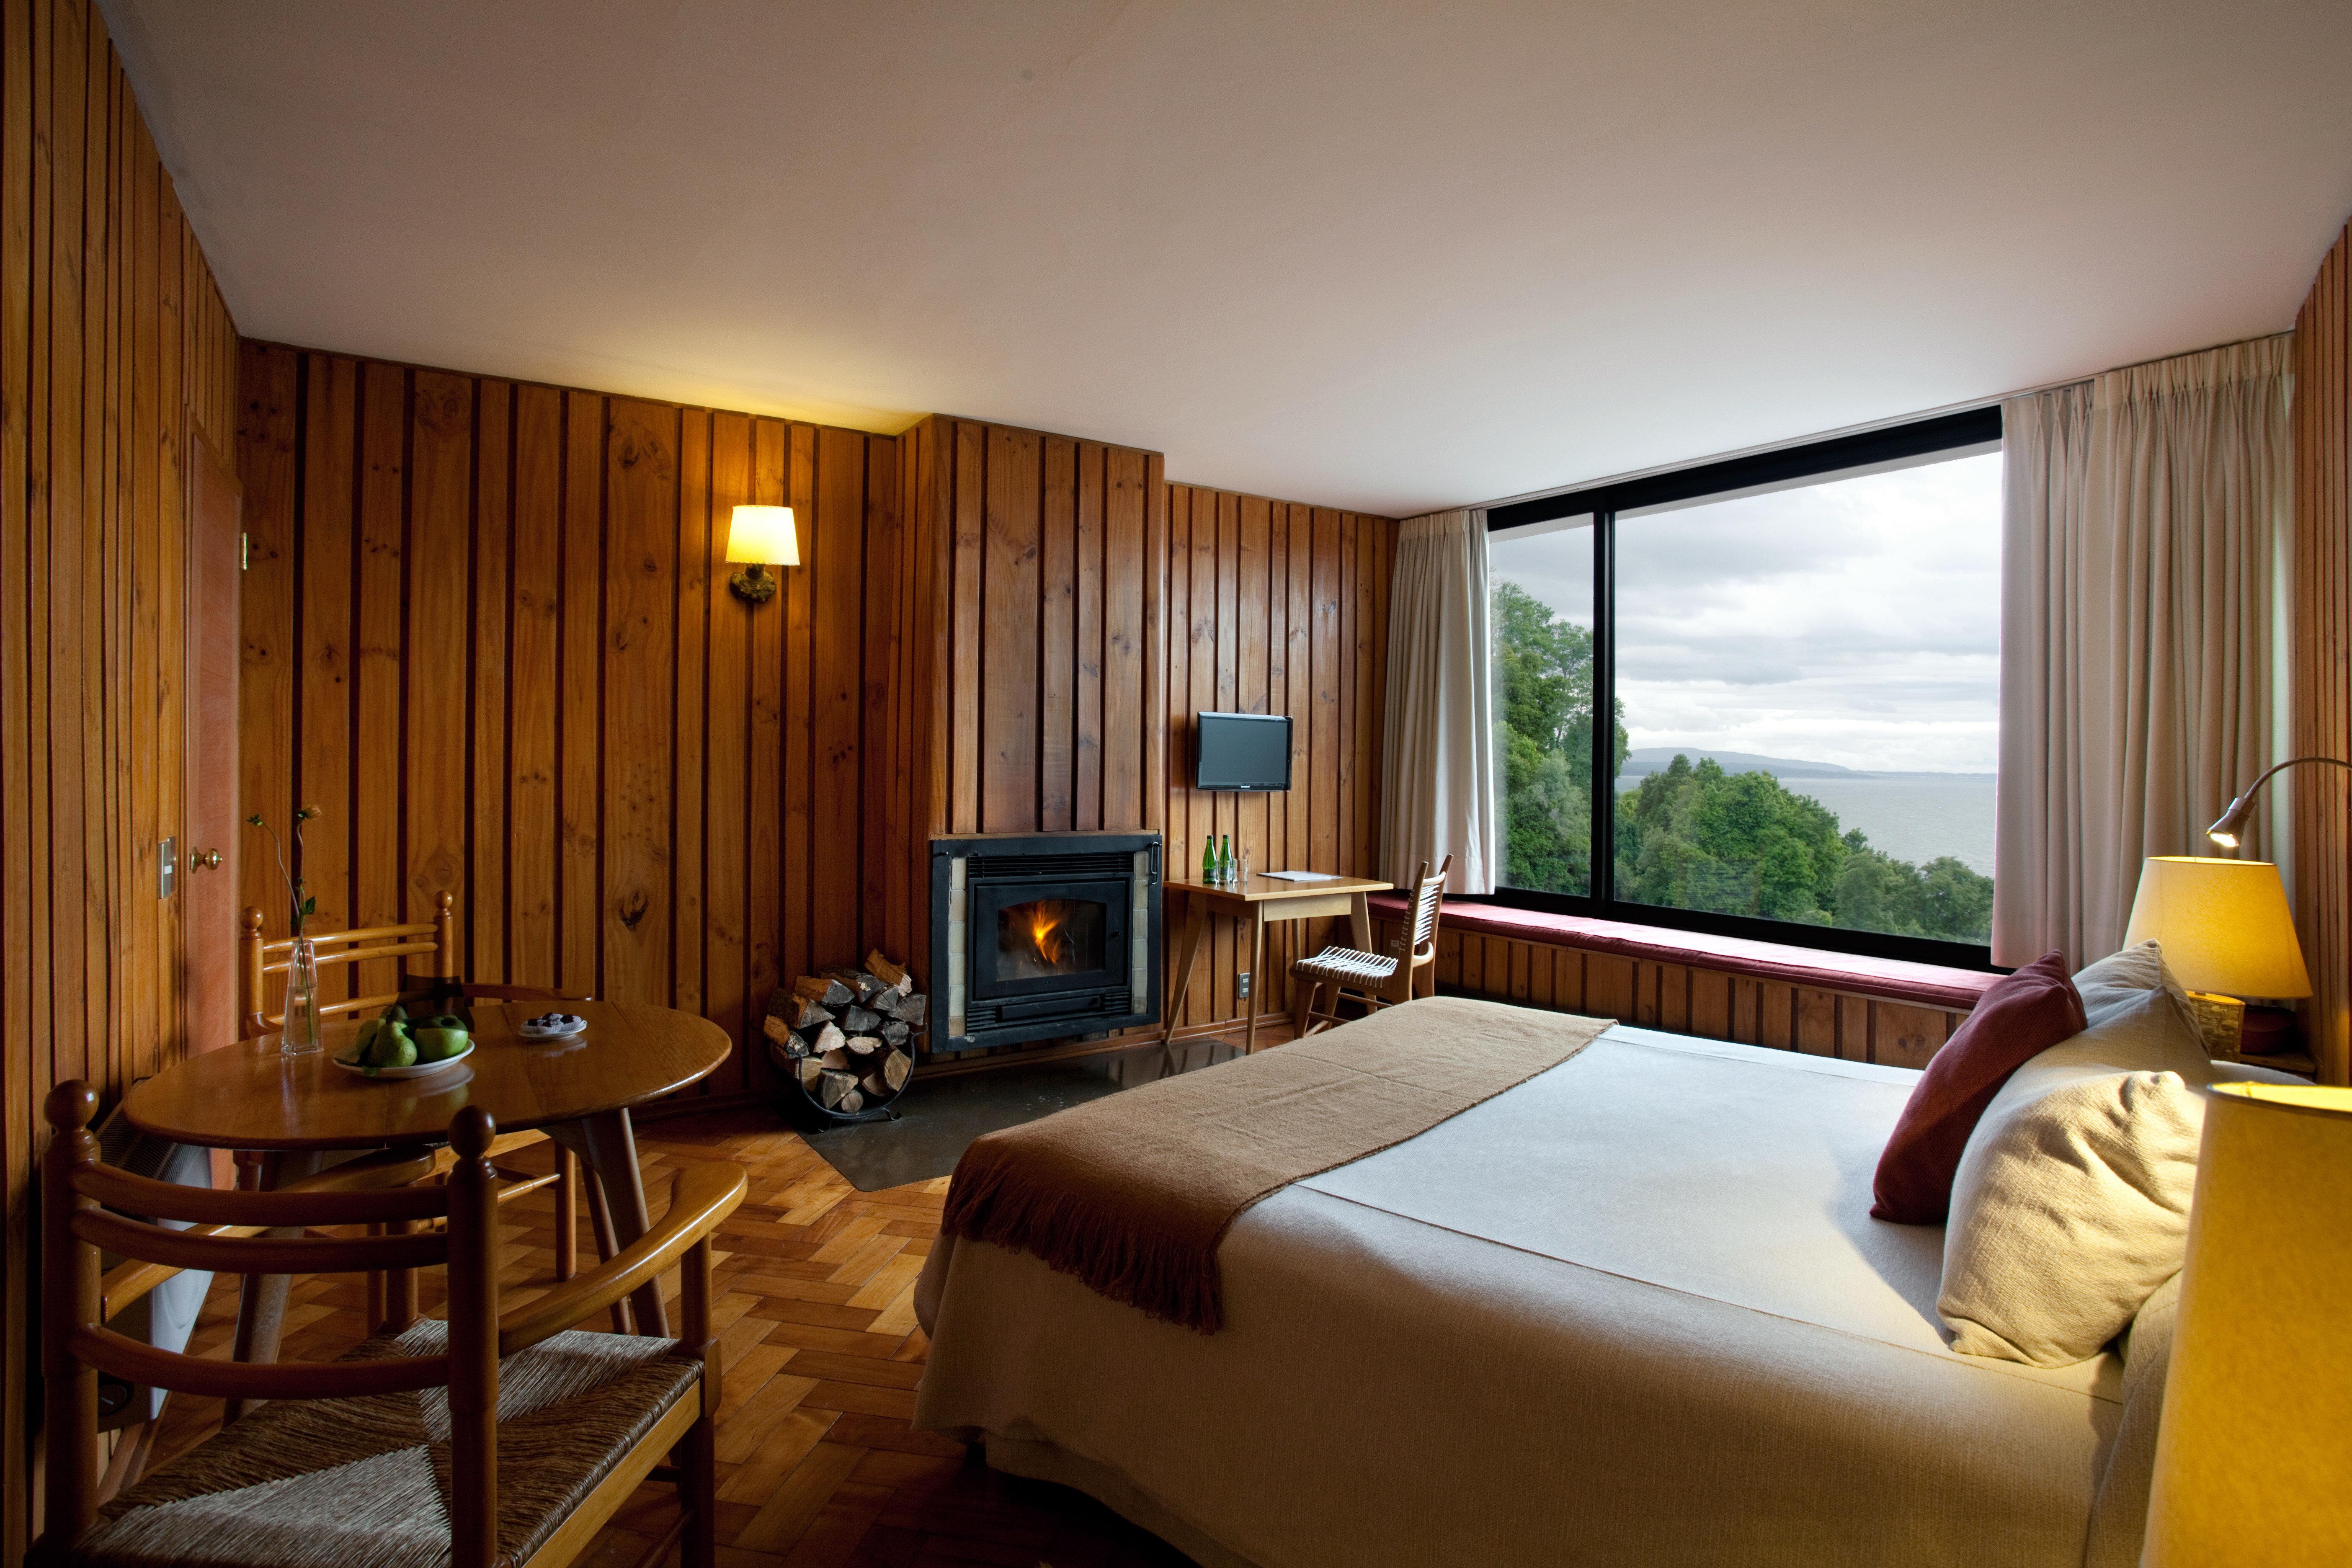 Bedroom Luxury Modern Resort Scenic views property Suite Villa cottage condominium